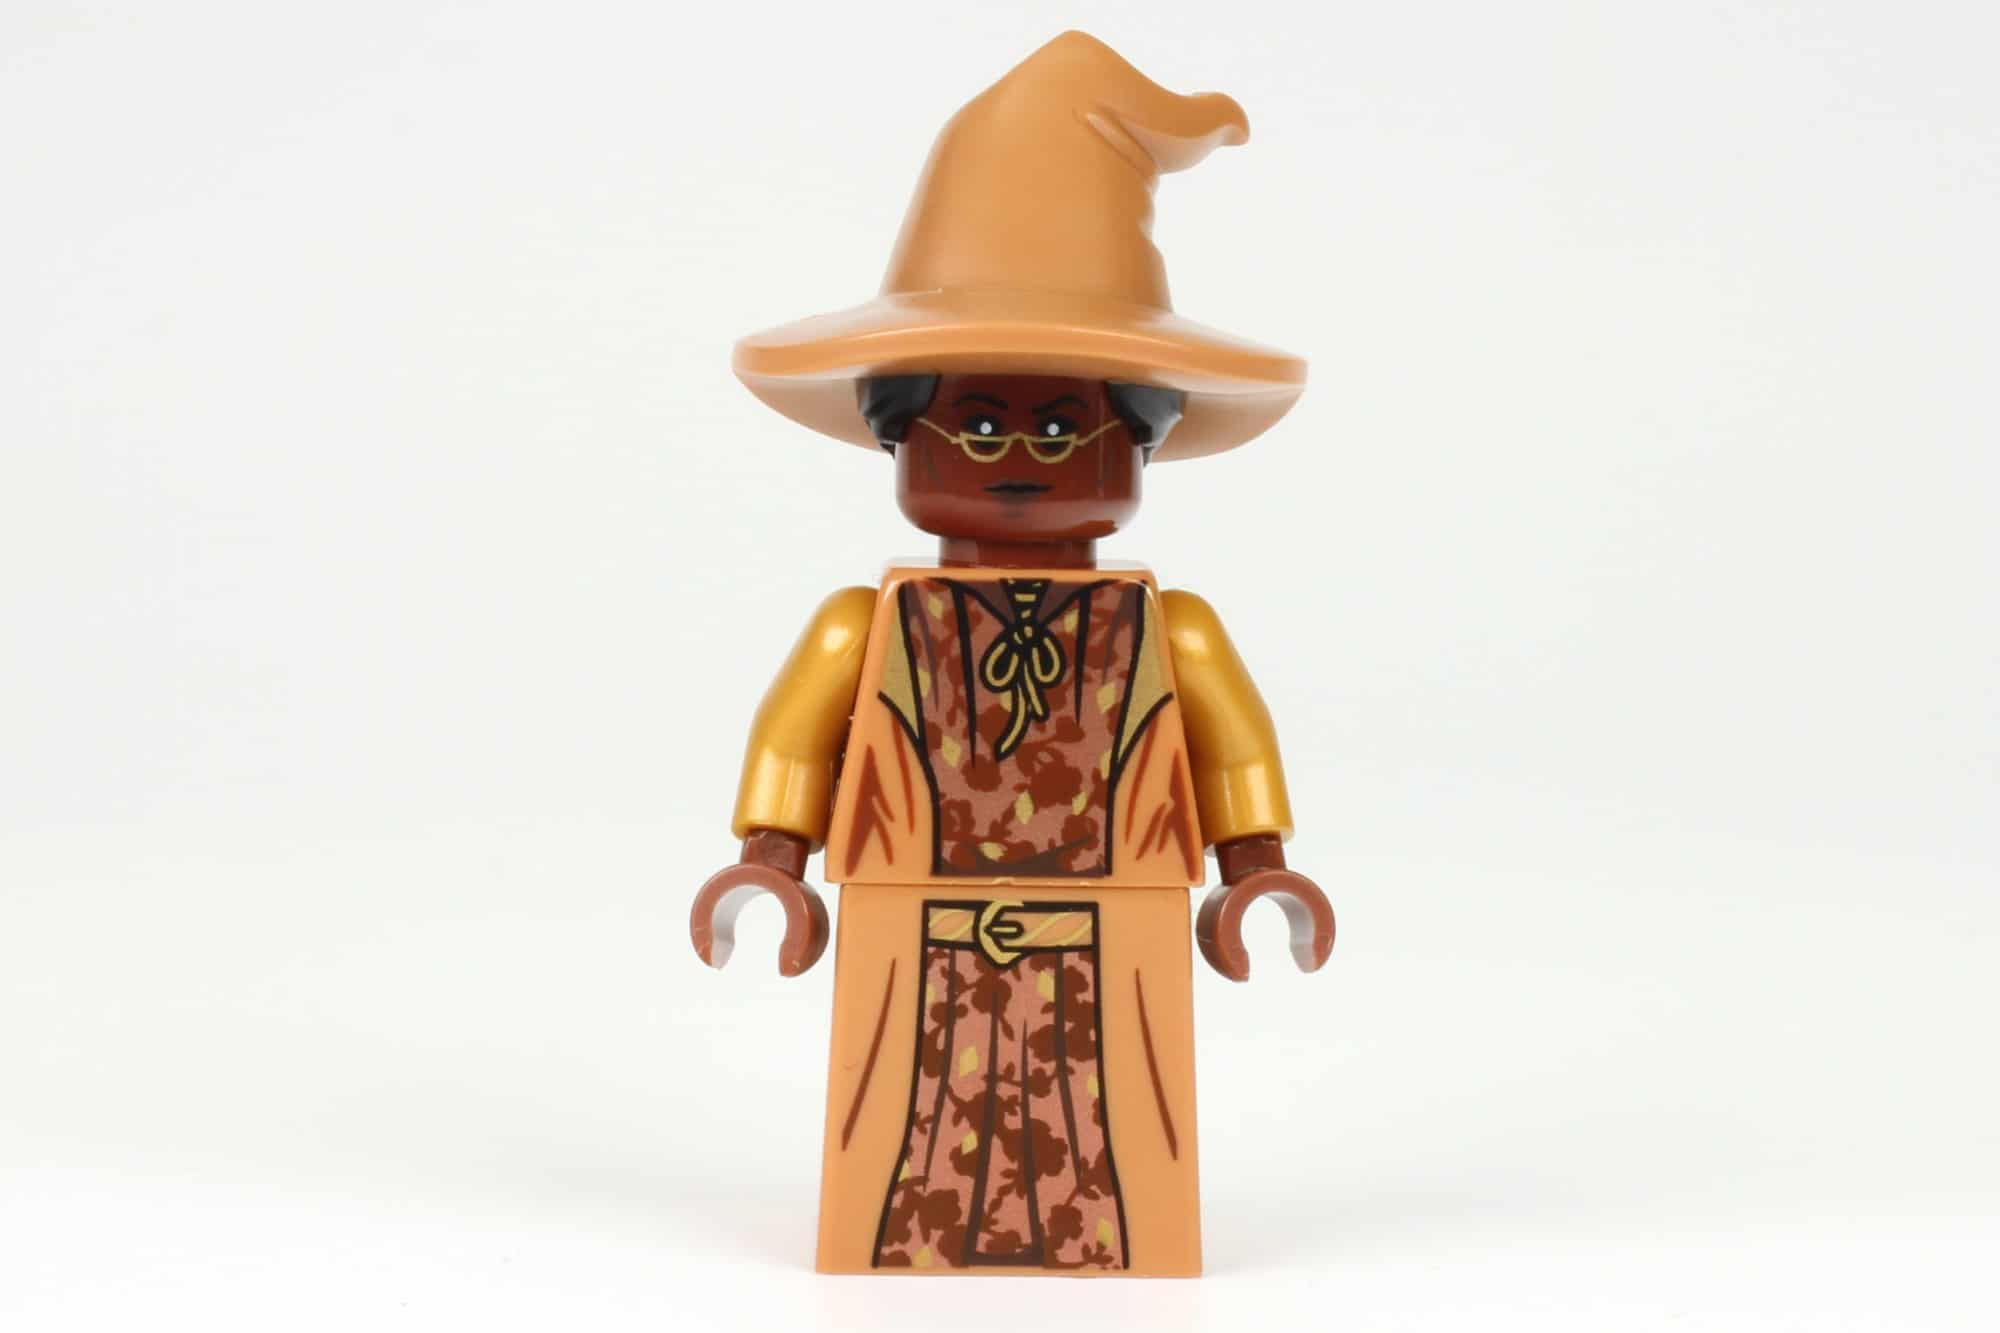 LEGO Harry Potter 76389 Hogwarts Kammer Des Schreckens Minifiguren 7 1